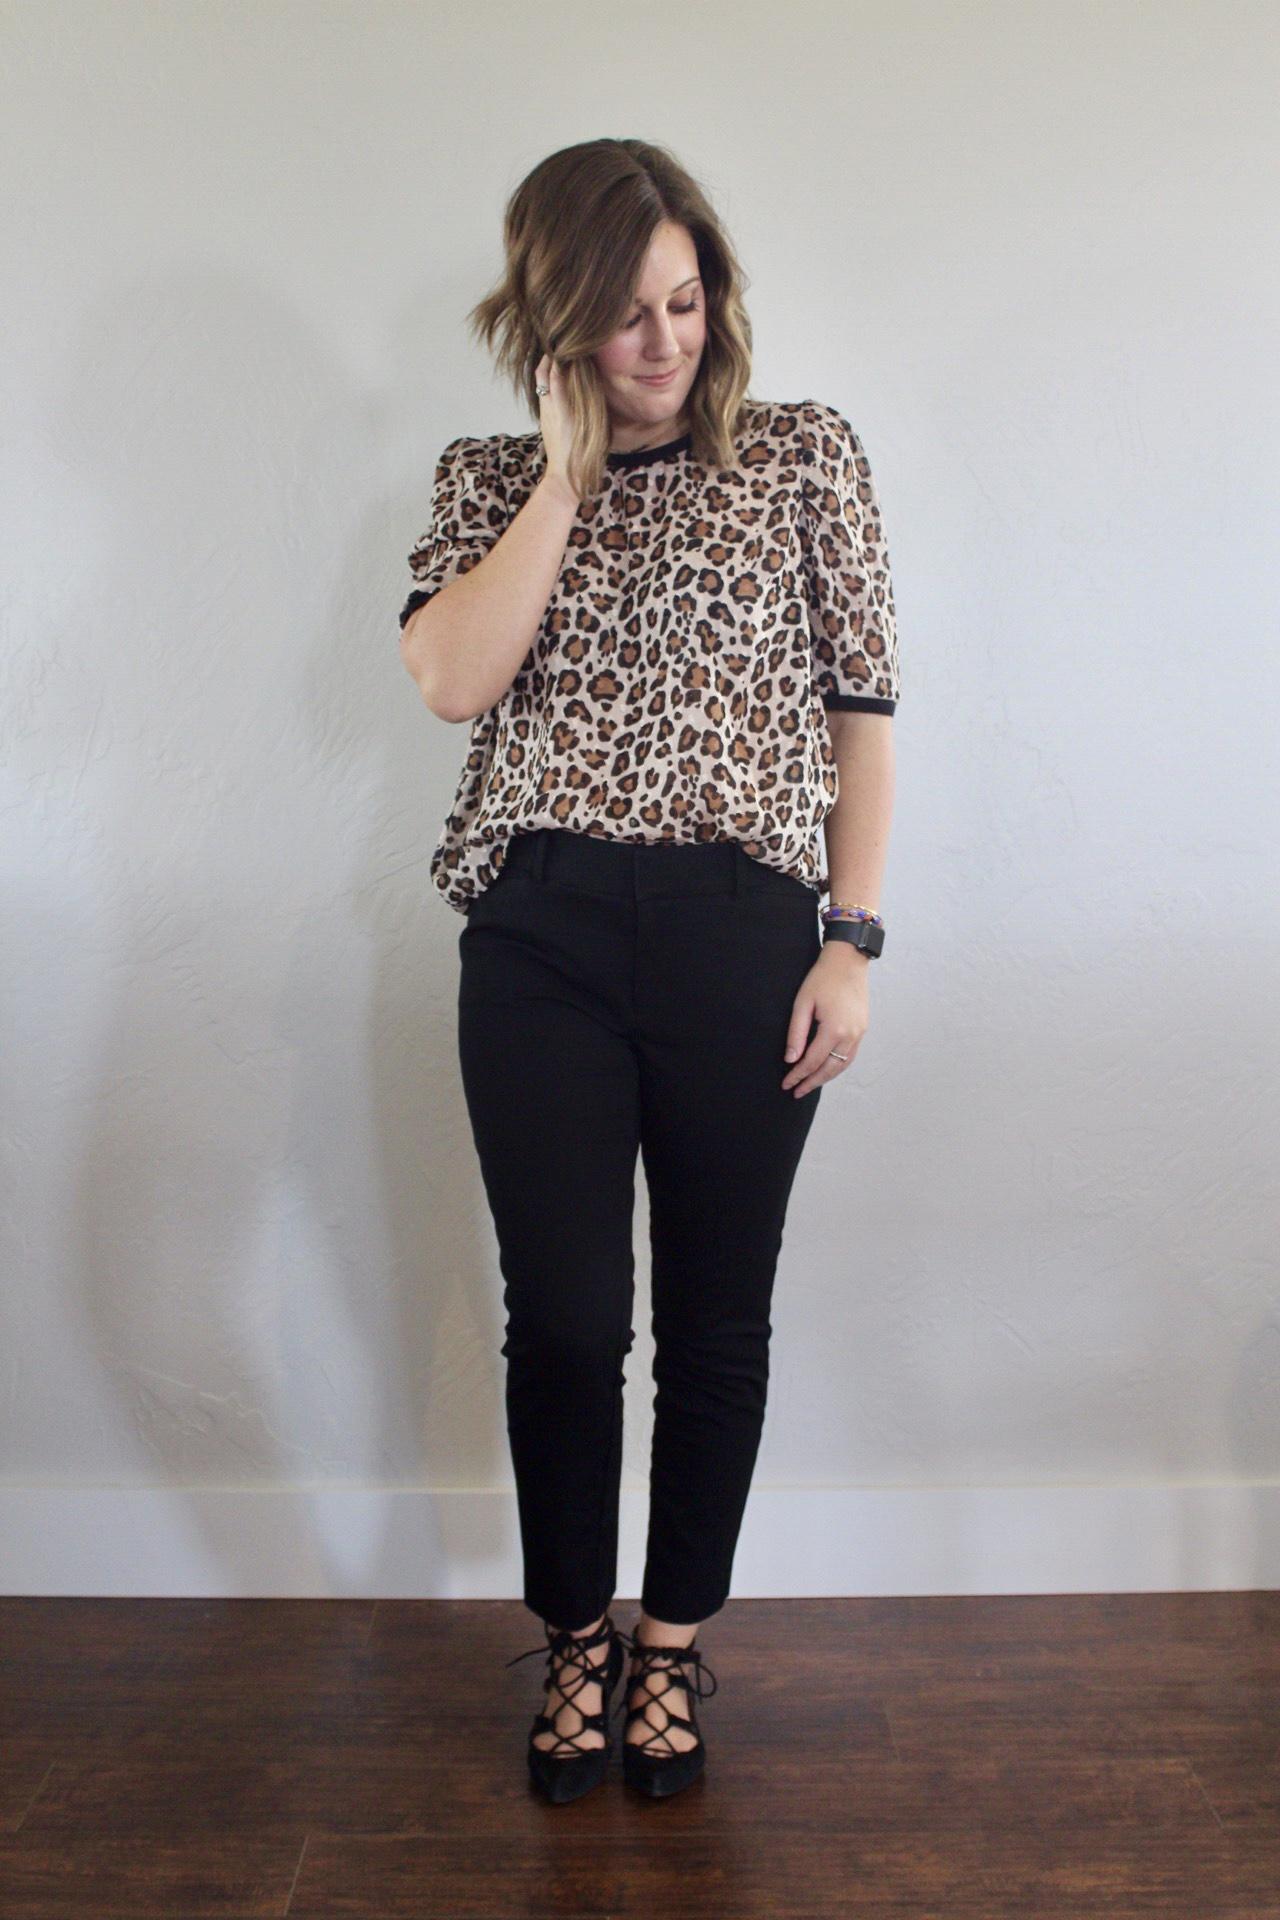 Target Workwear for Fall | natalieponder.com